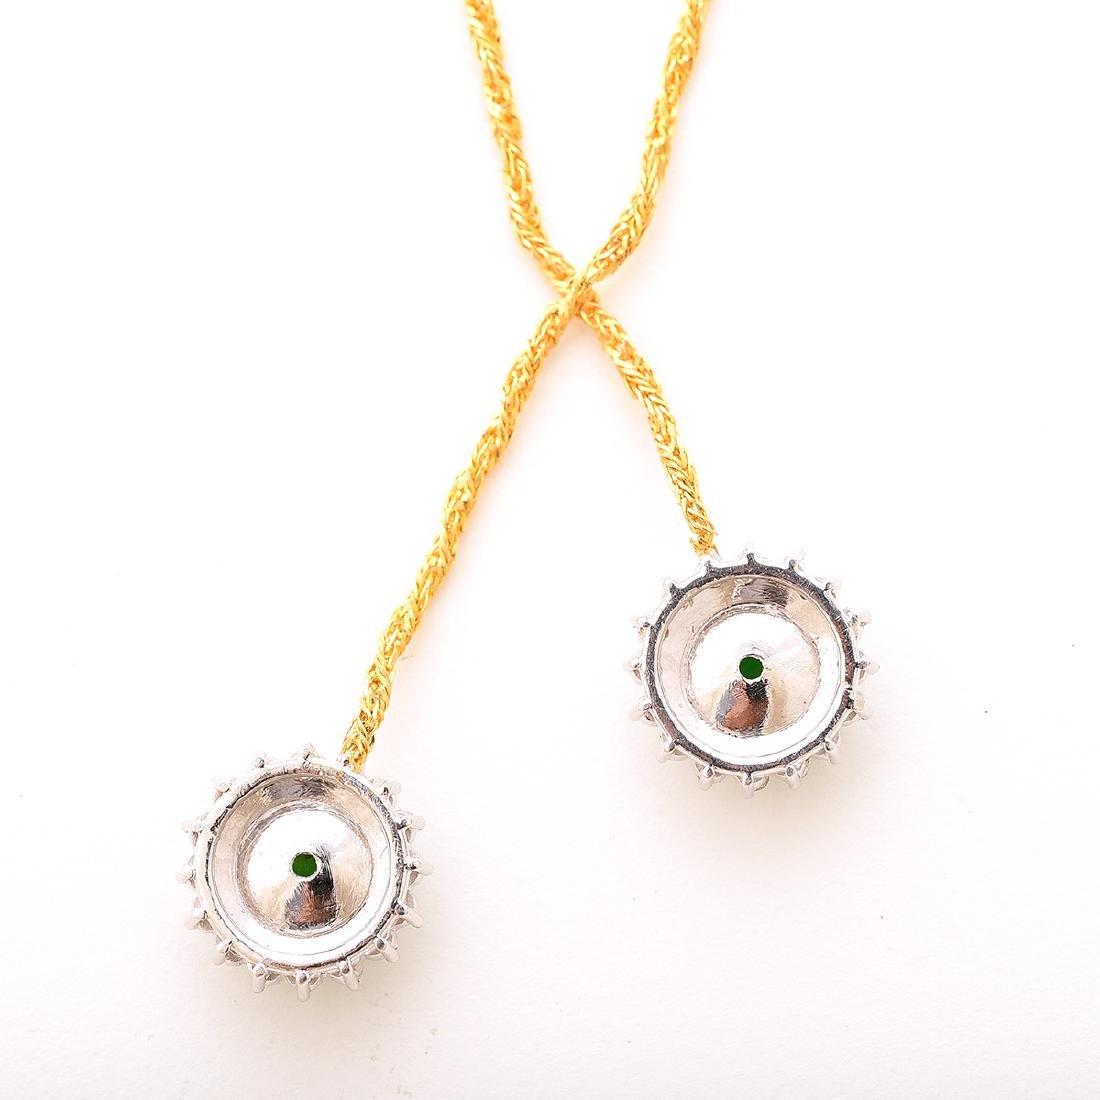 Jade, Diamond, 14k Gold Necklace. - 3